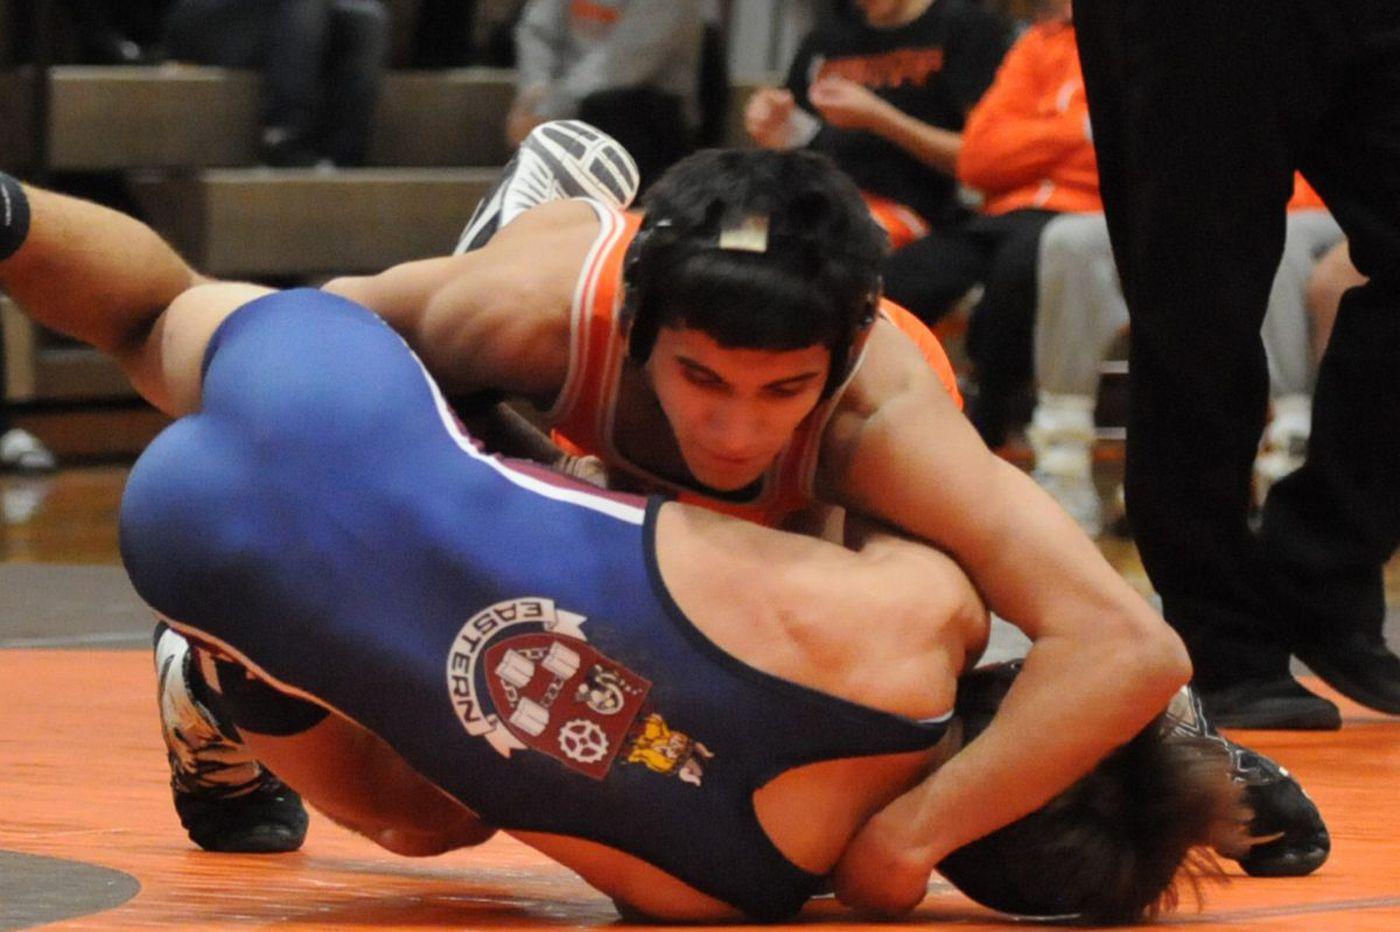 Collin Wickramaratna leads way for Cherokee wrestling